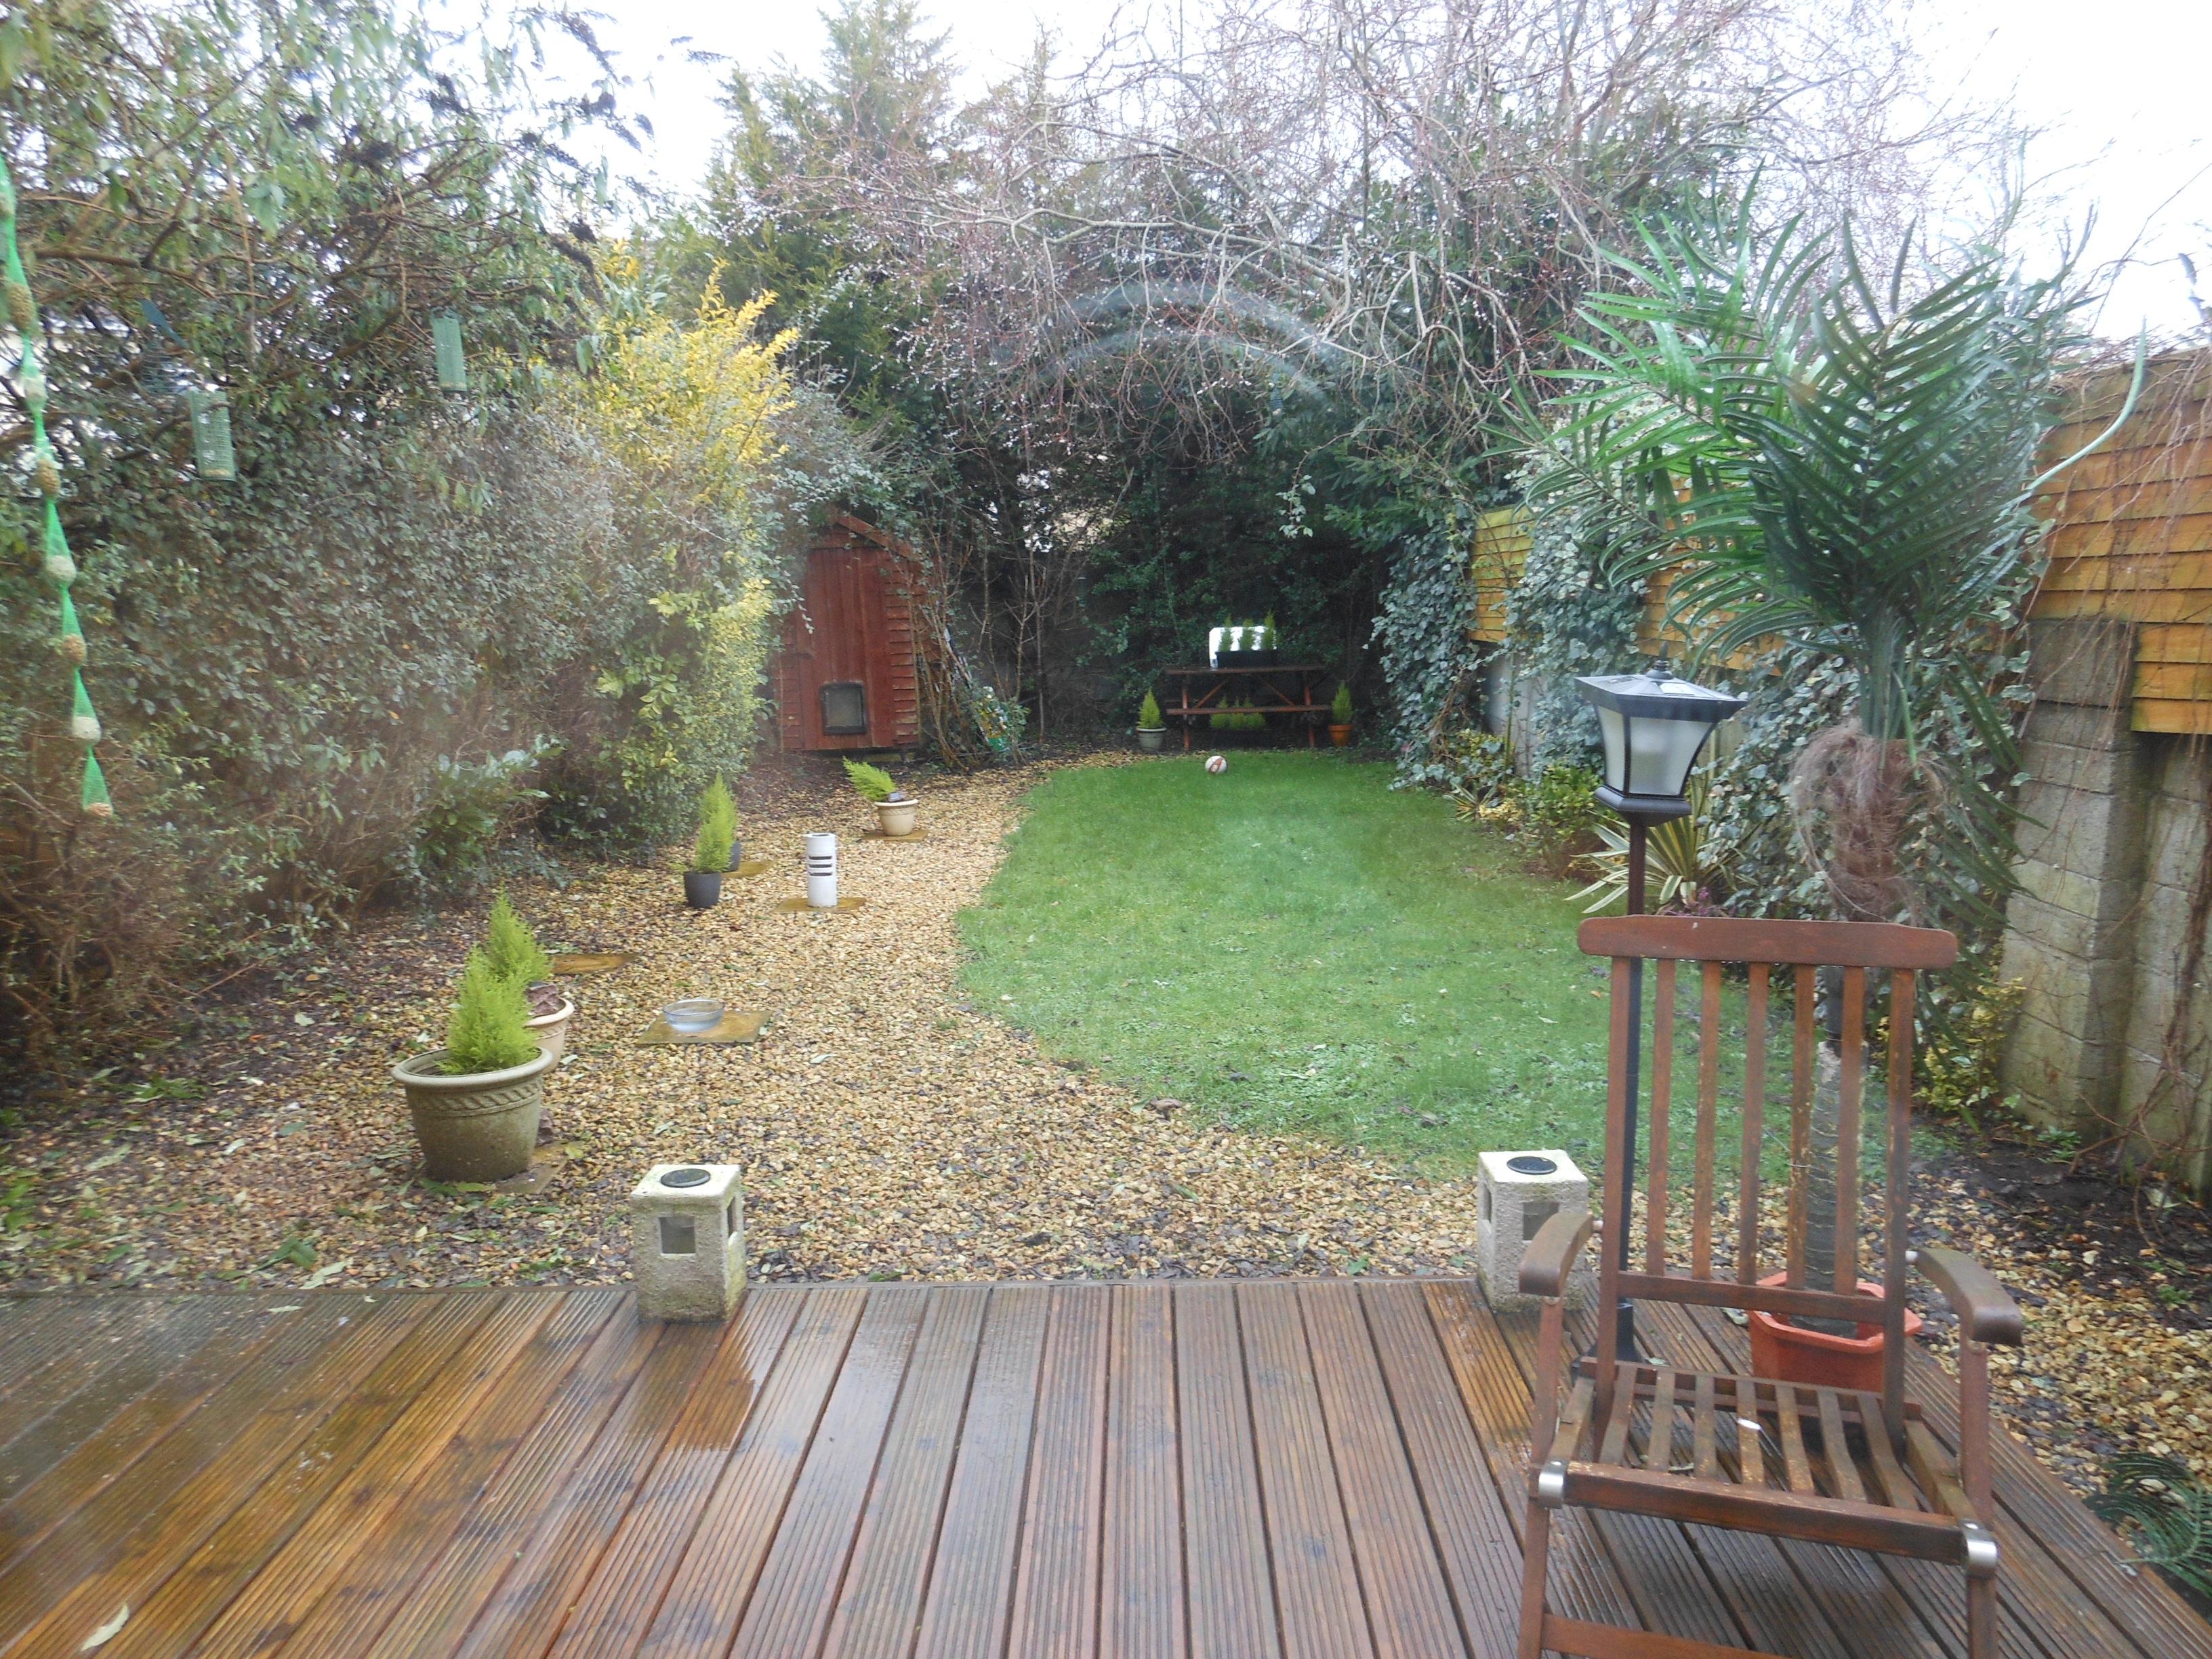 meu quintal meu jardim : meu quintal meu jardim:dublin